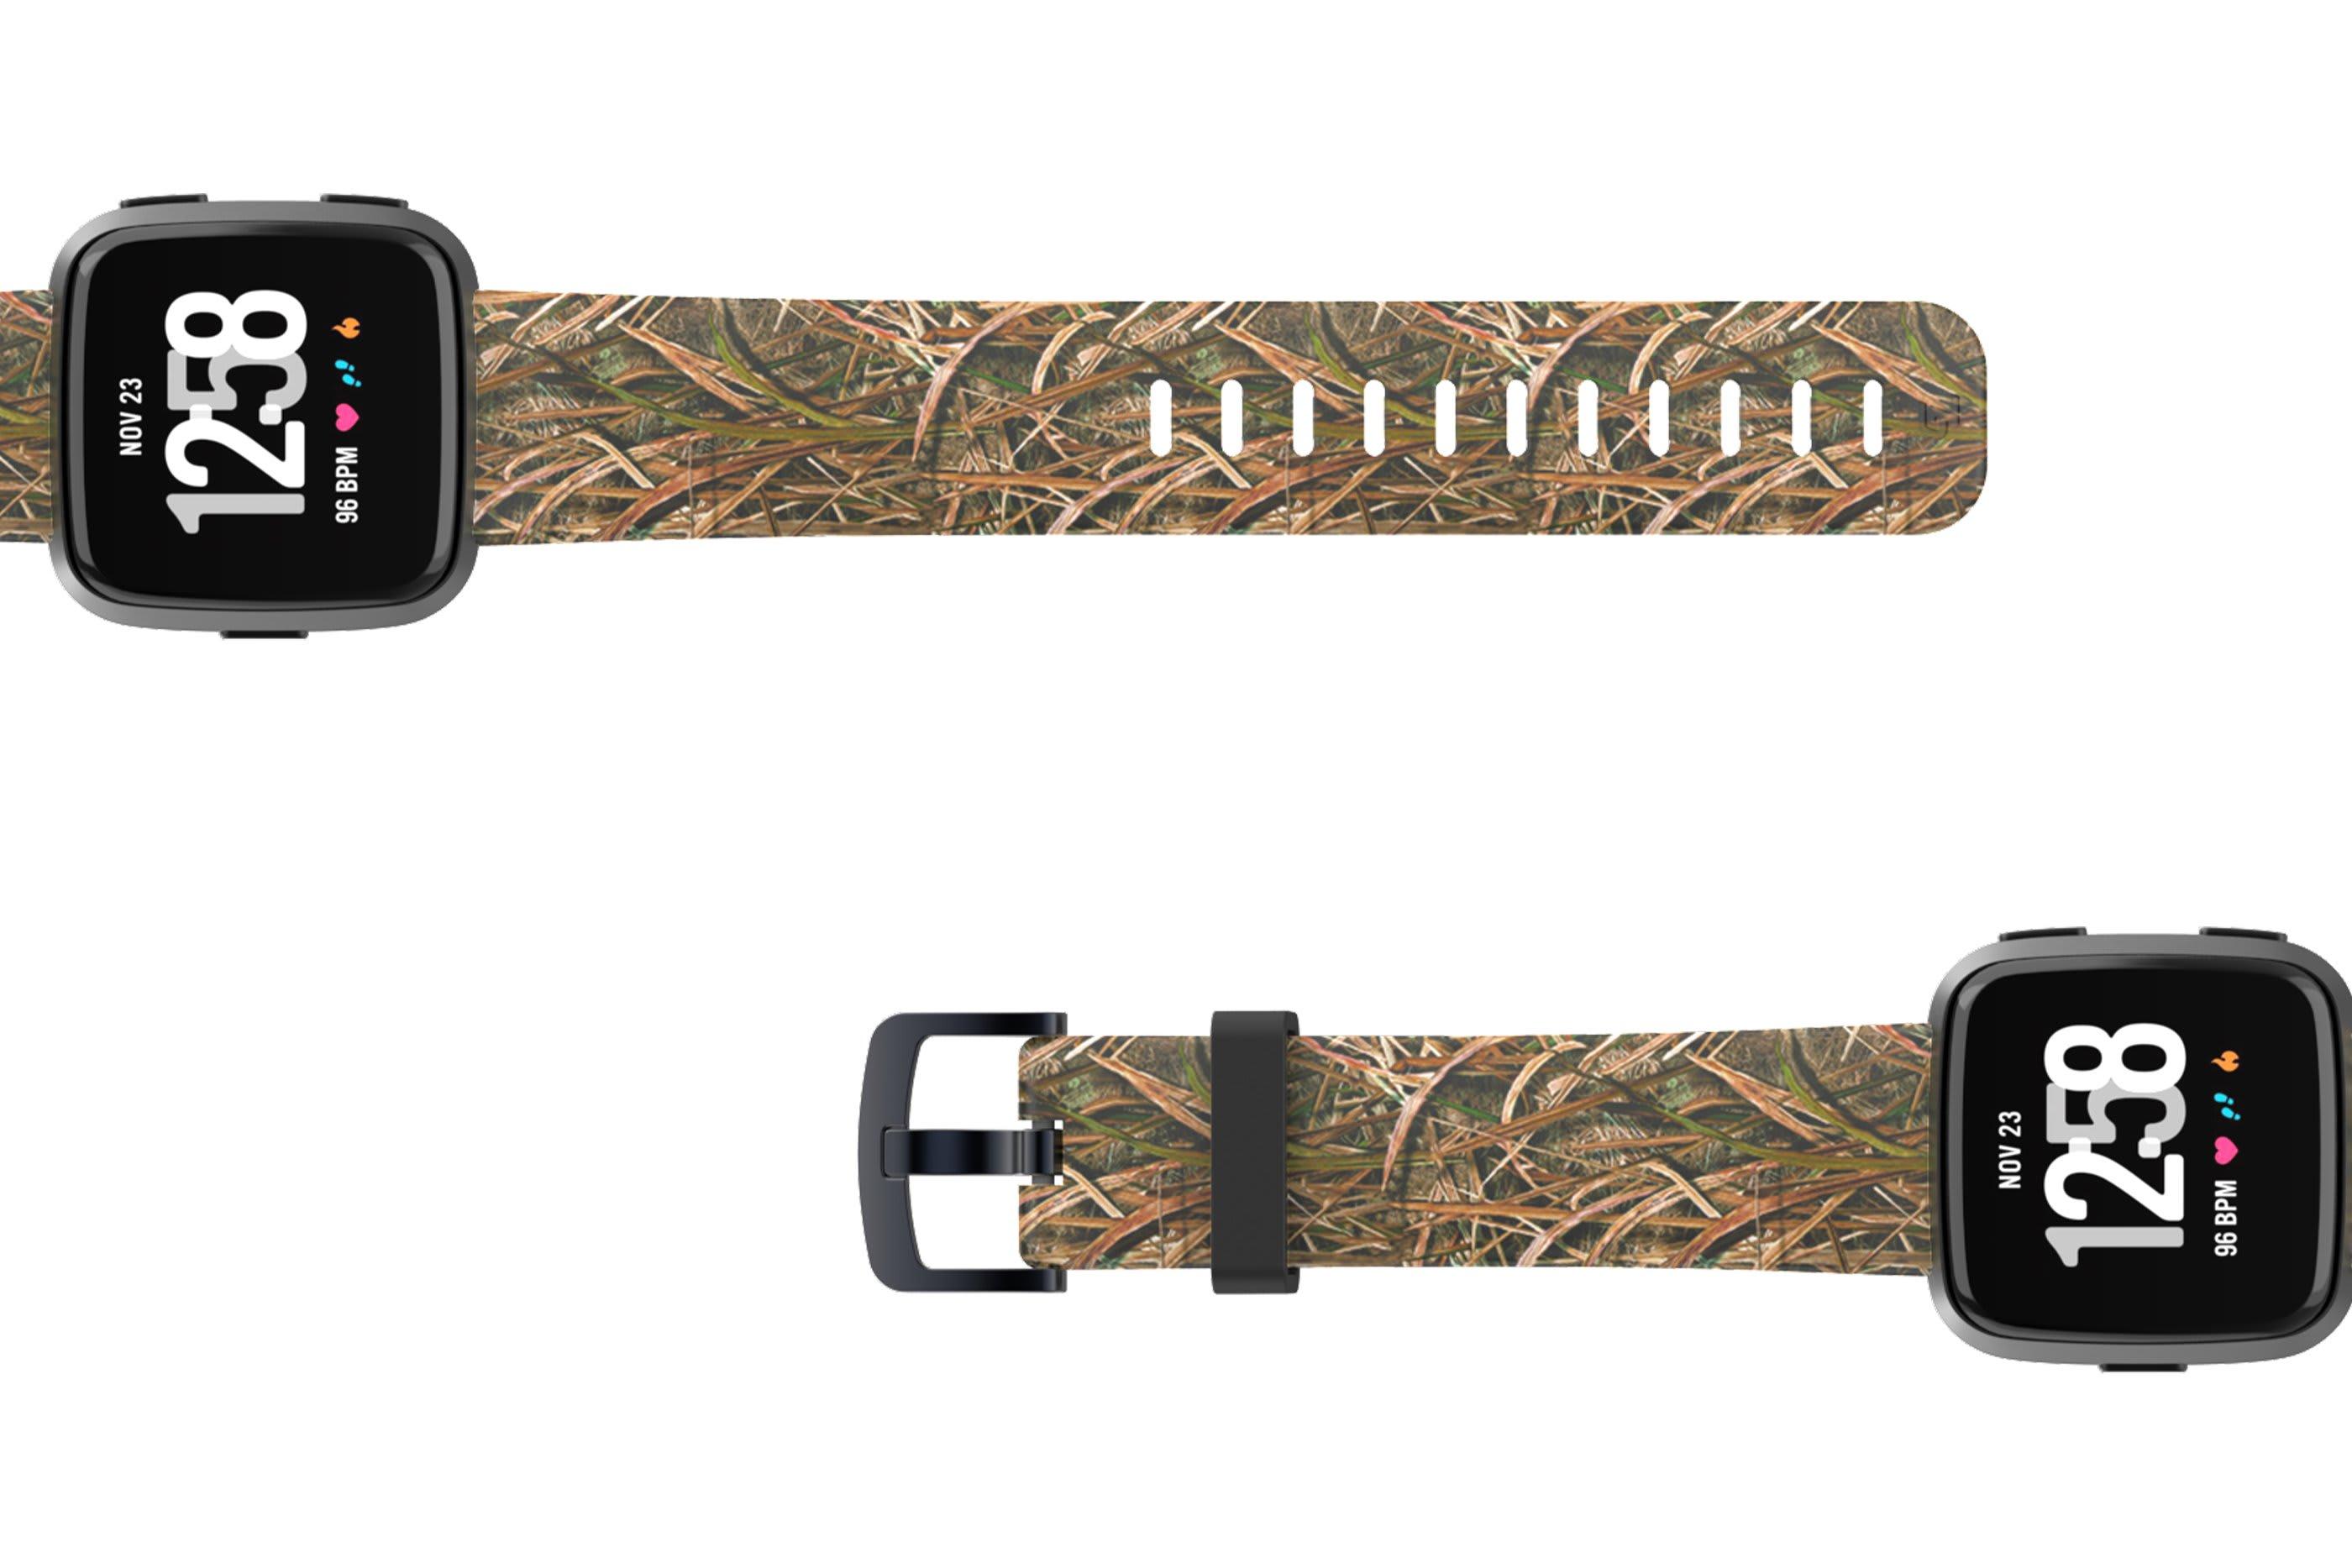 Mossy Oak Blades Fitbit Versa watch band viewed top down